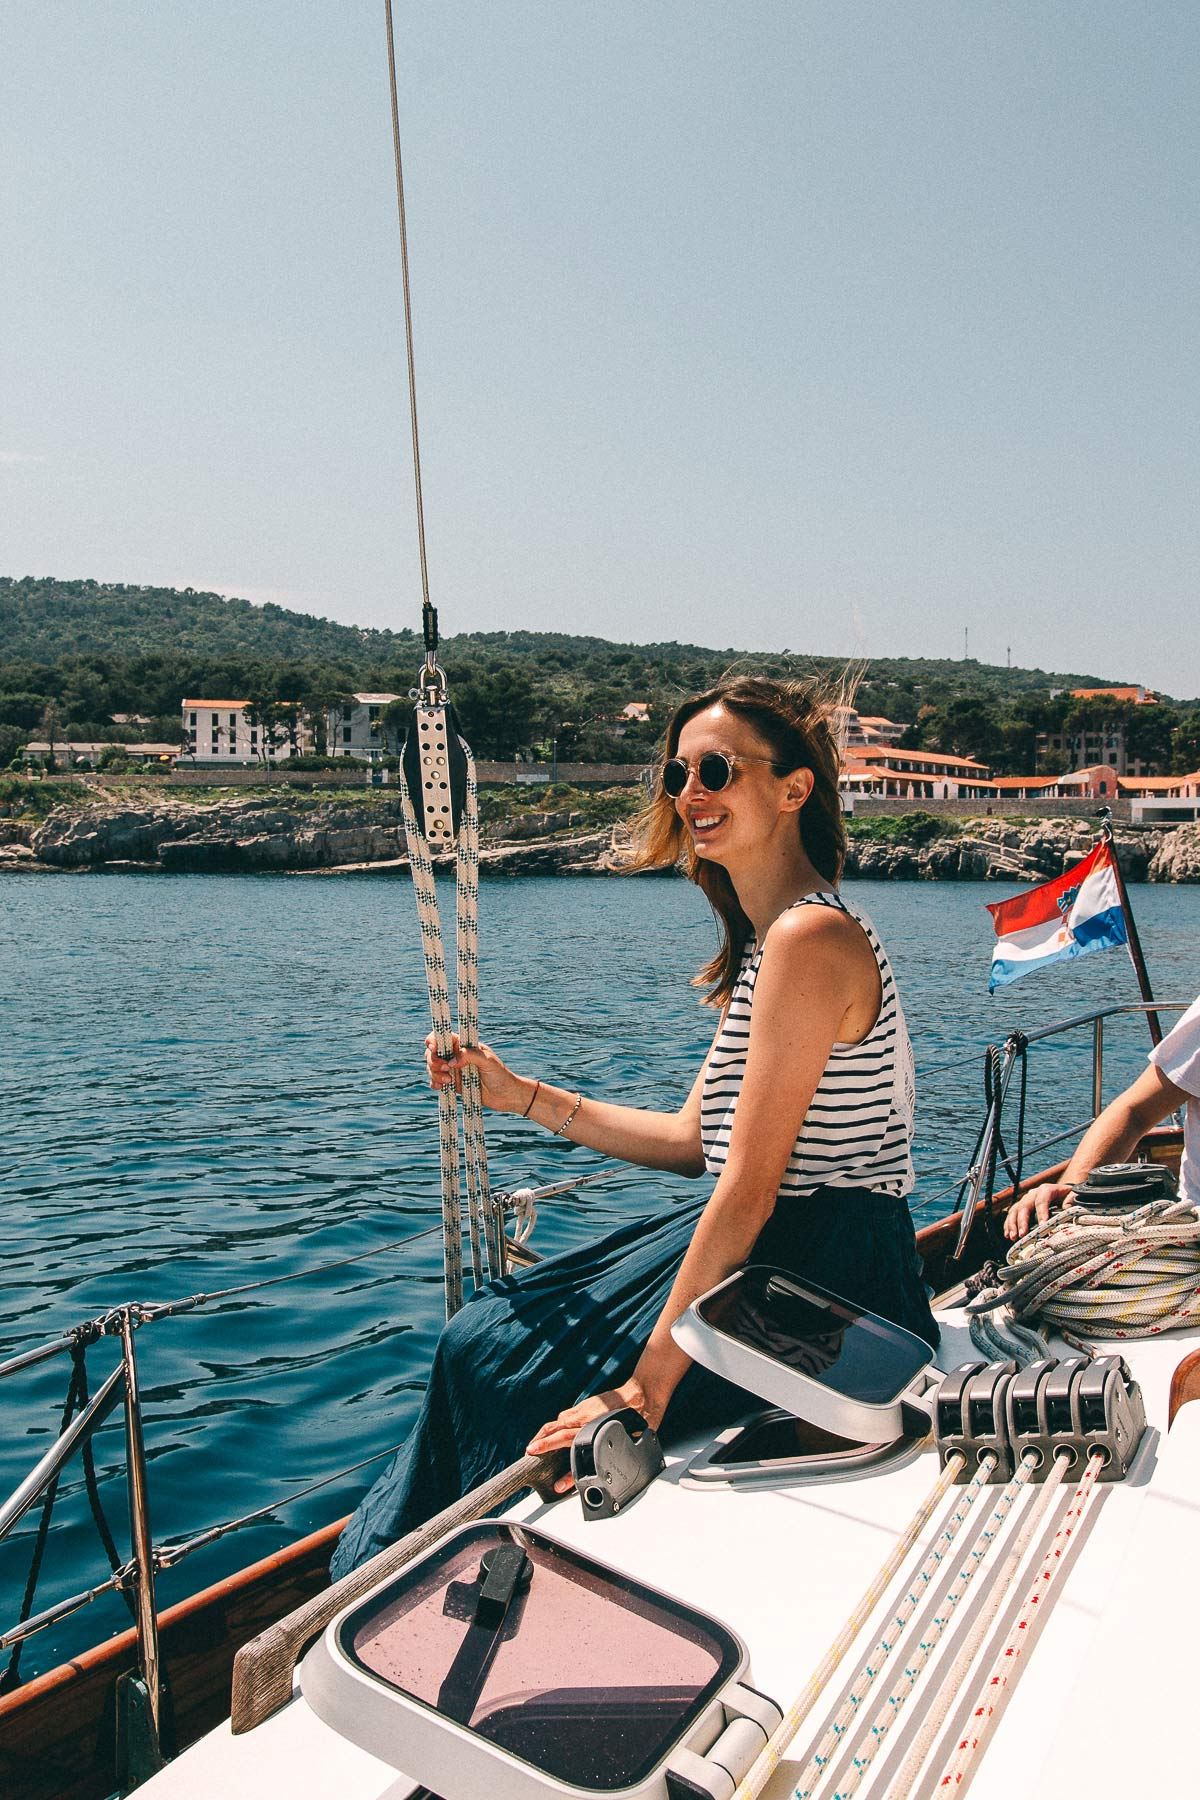 Segeln in Kroatien, ein Traum!